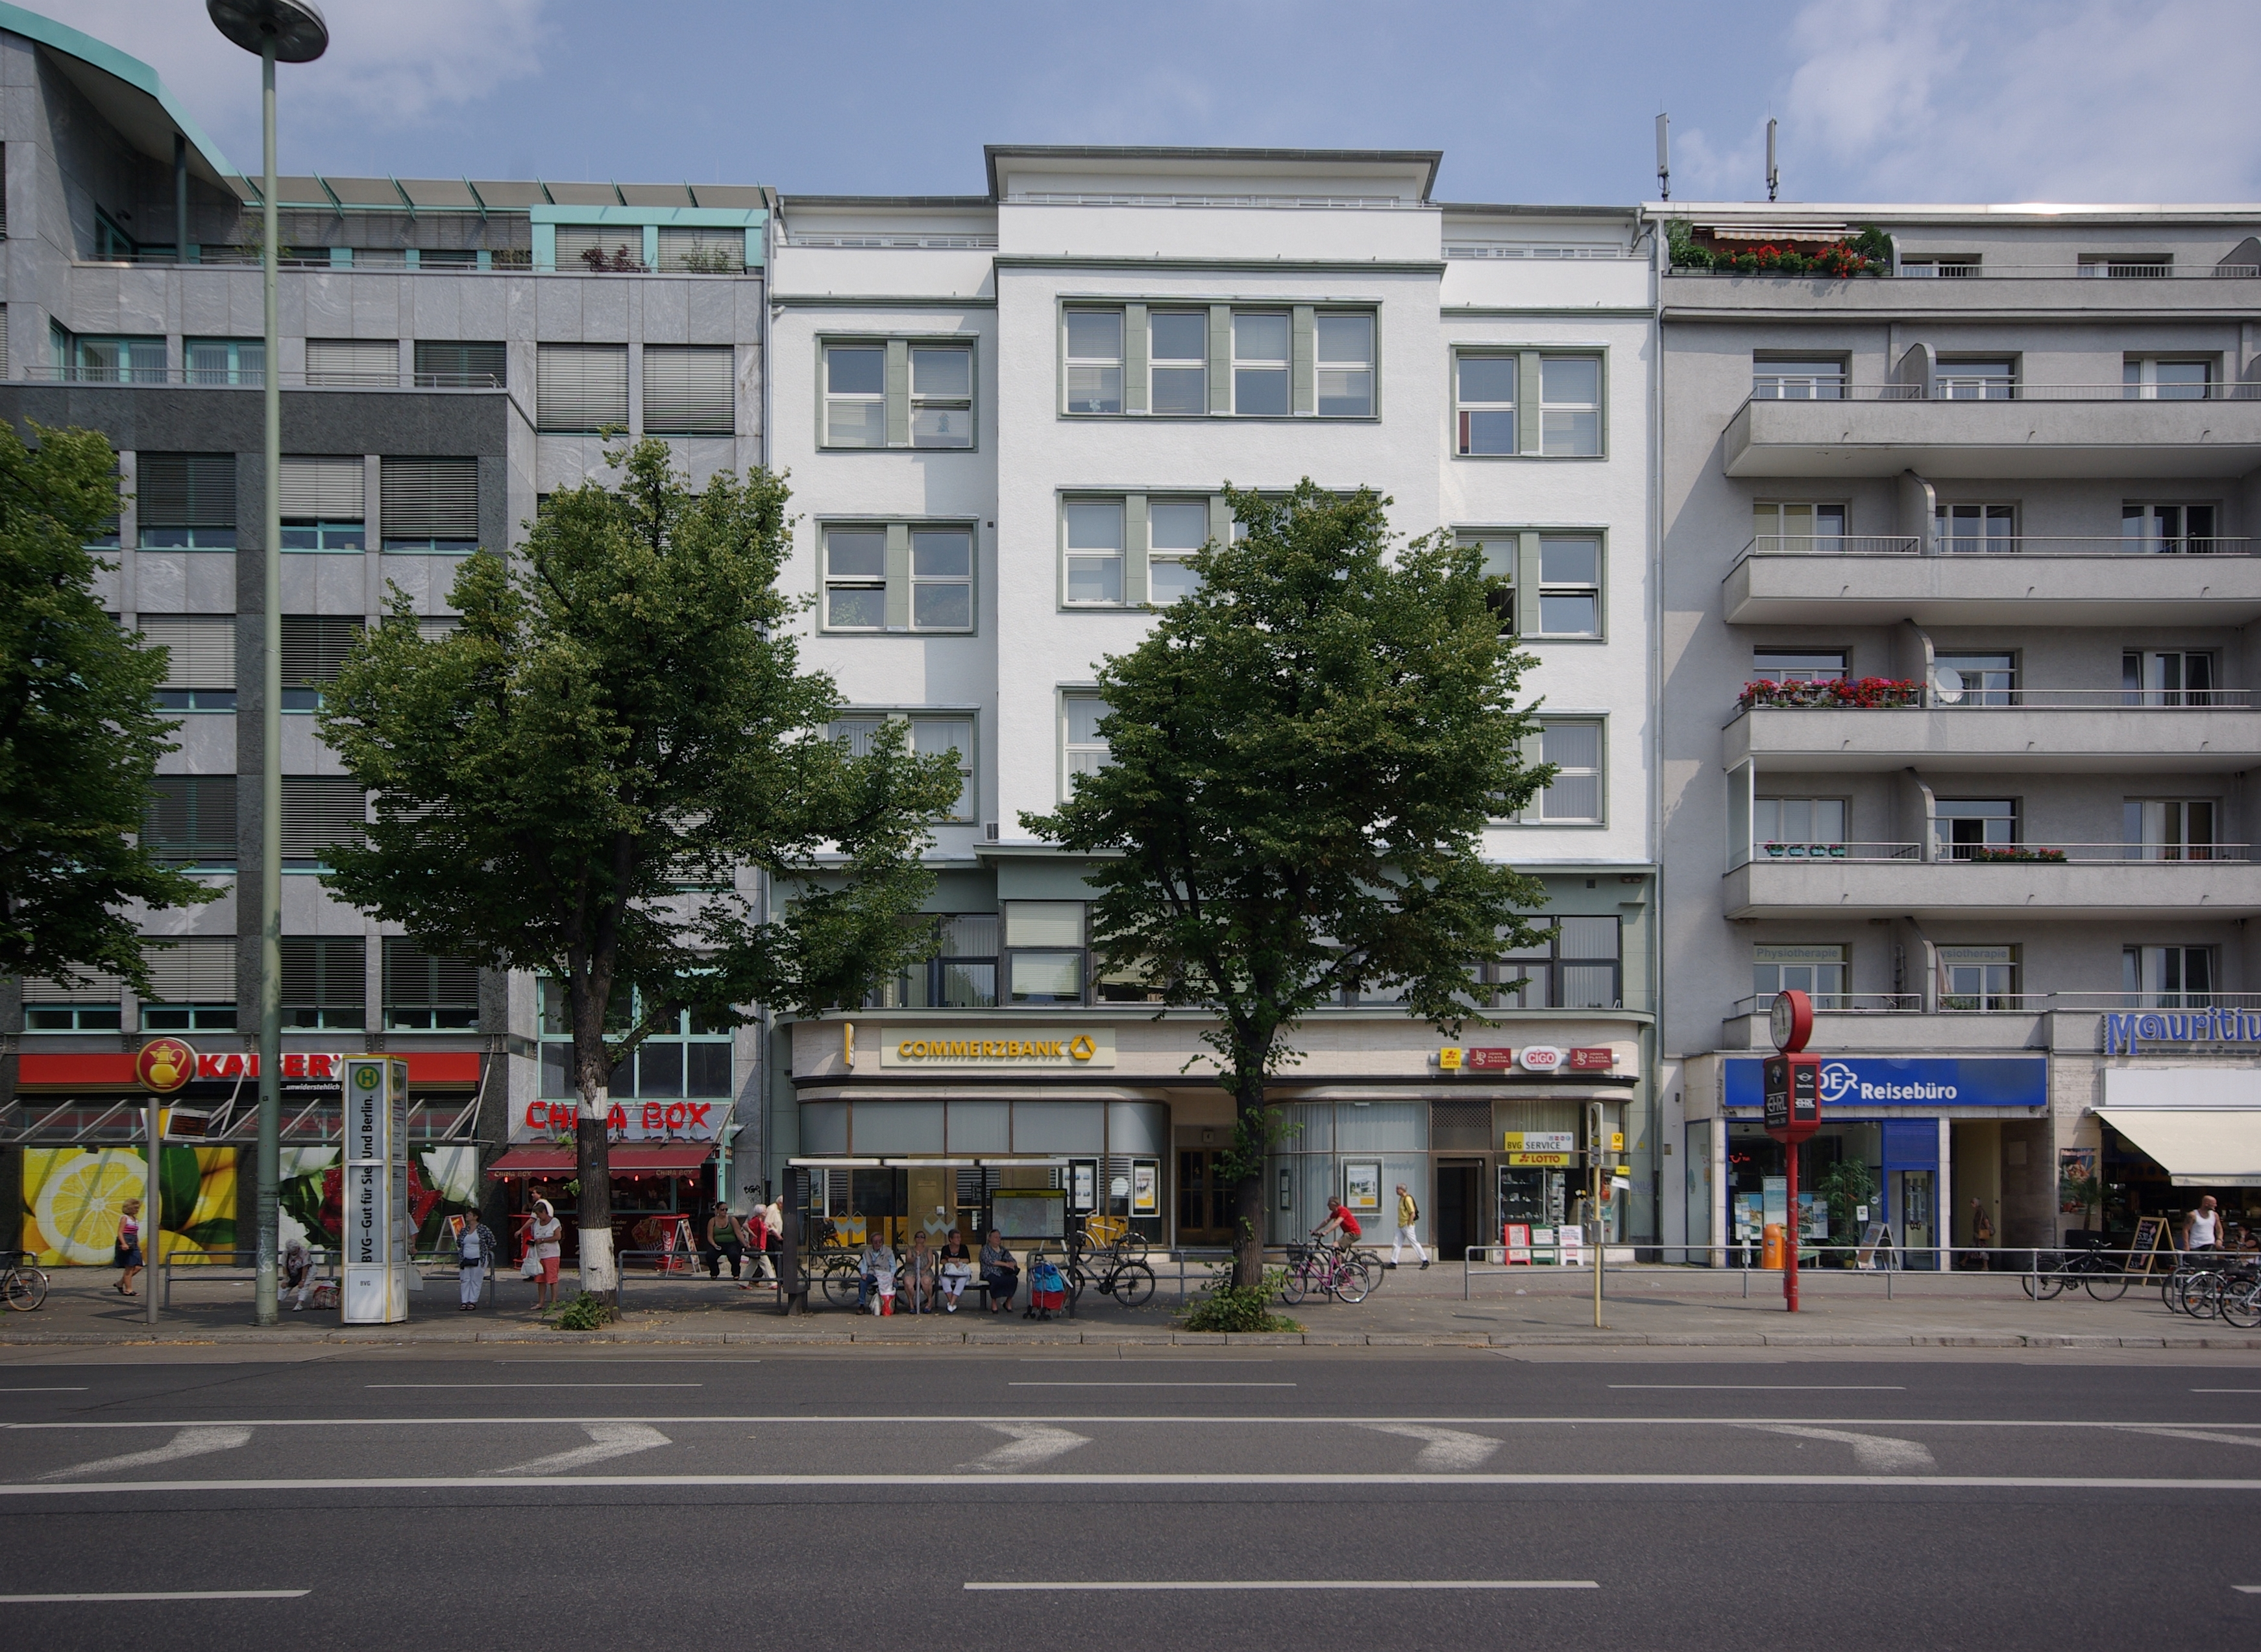 file theodor heuss platz 4 berlin wikimedia commons. Black Bedroom Furniture Sets. Home Design Ideas